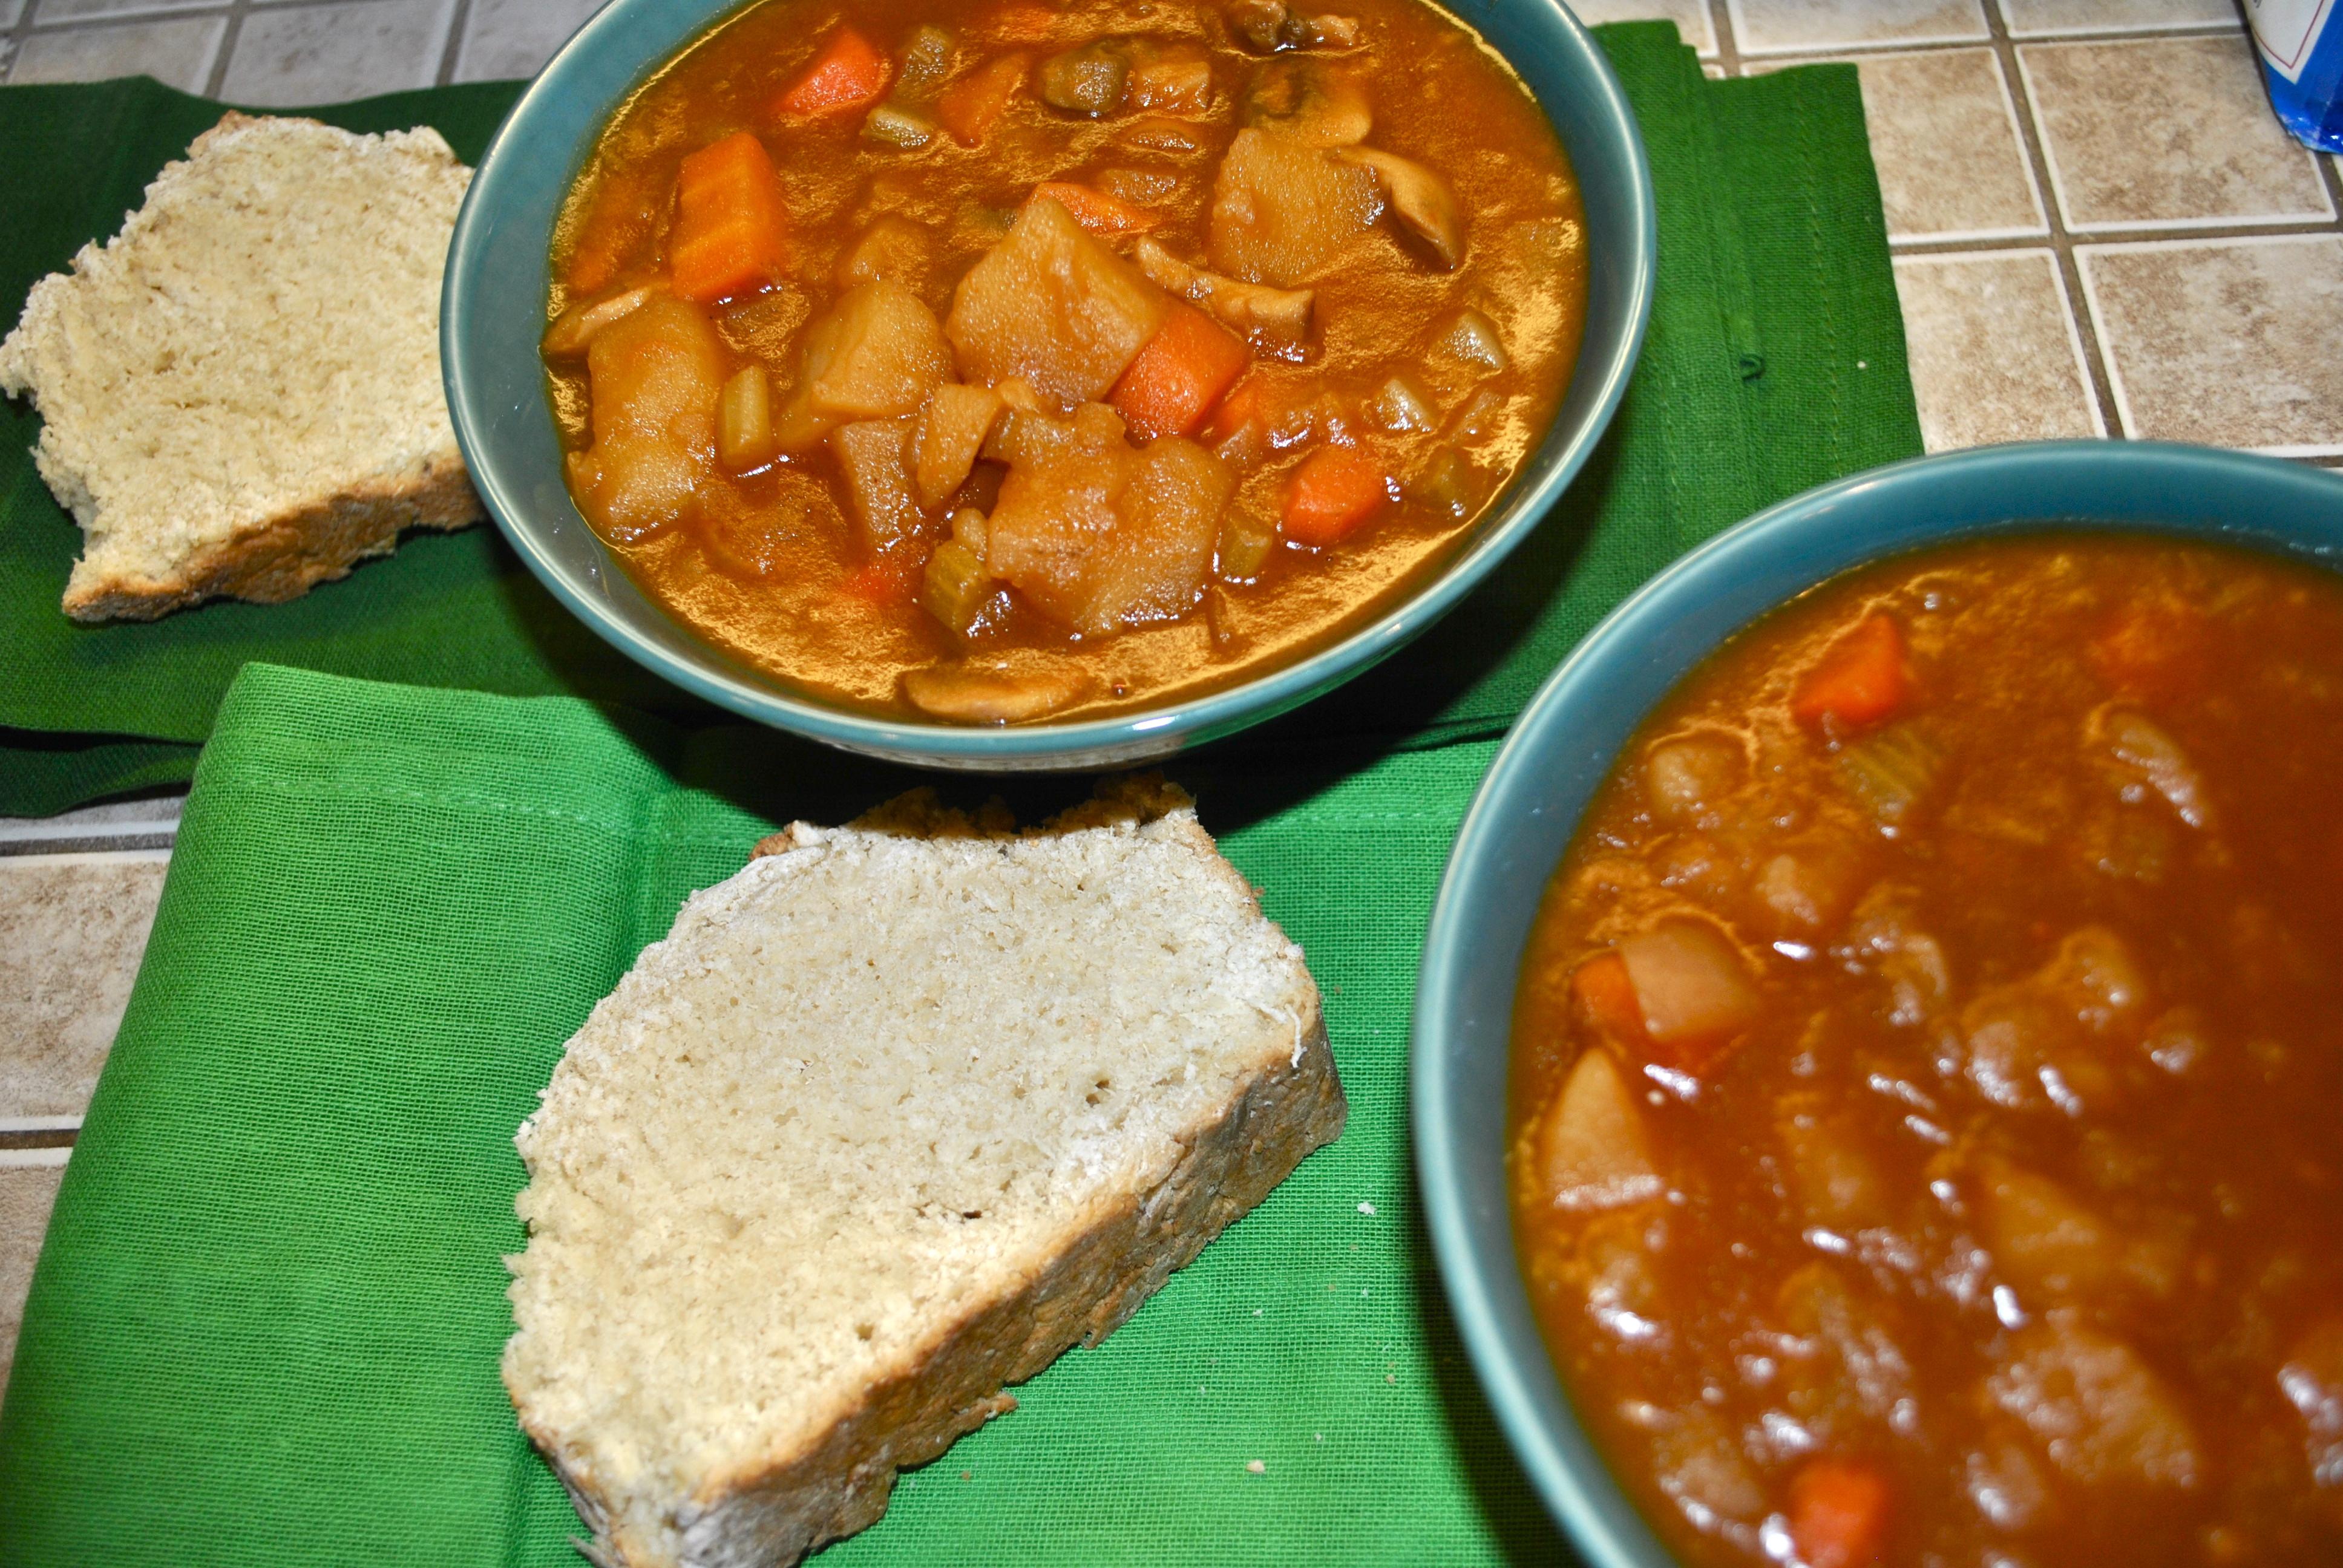 Vegan Guinness Stew